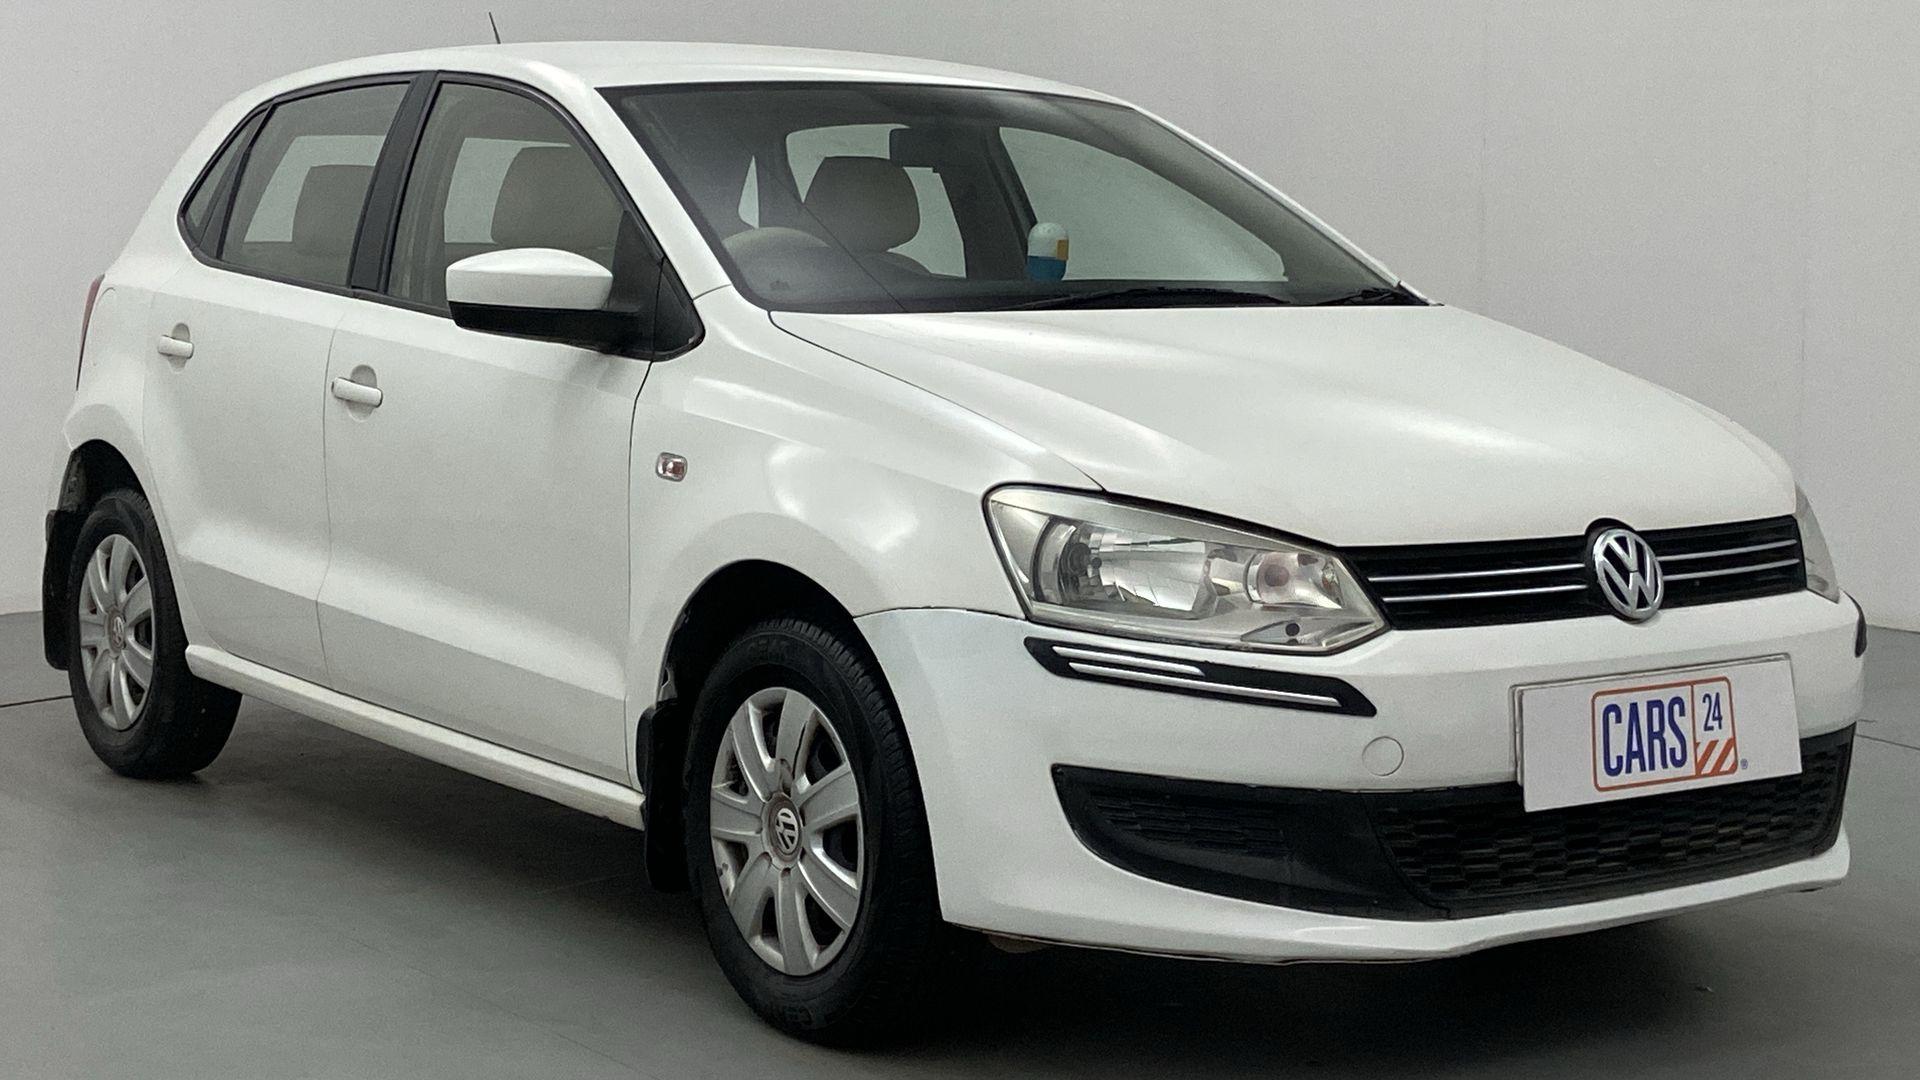 2010 Volkswagen Polo TRENDLINE 1.2L PETROL